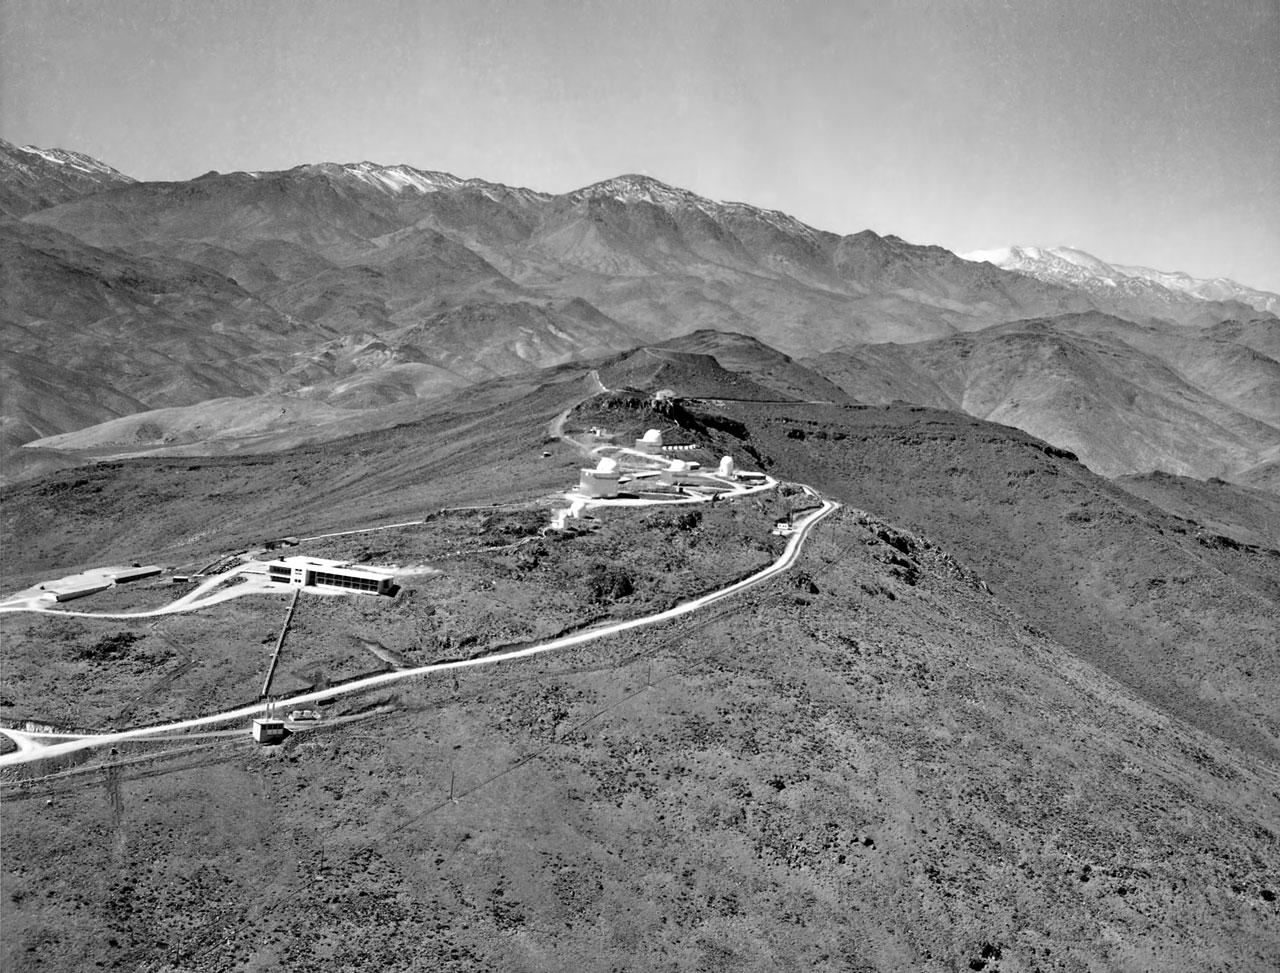 Flying above La Silla in 1970